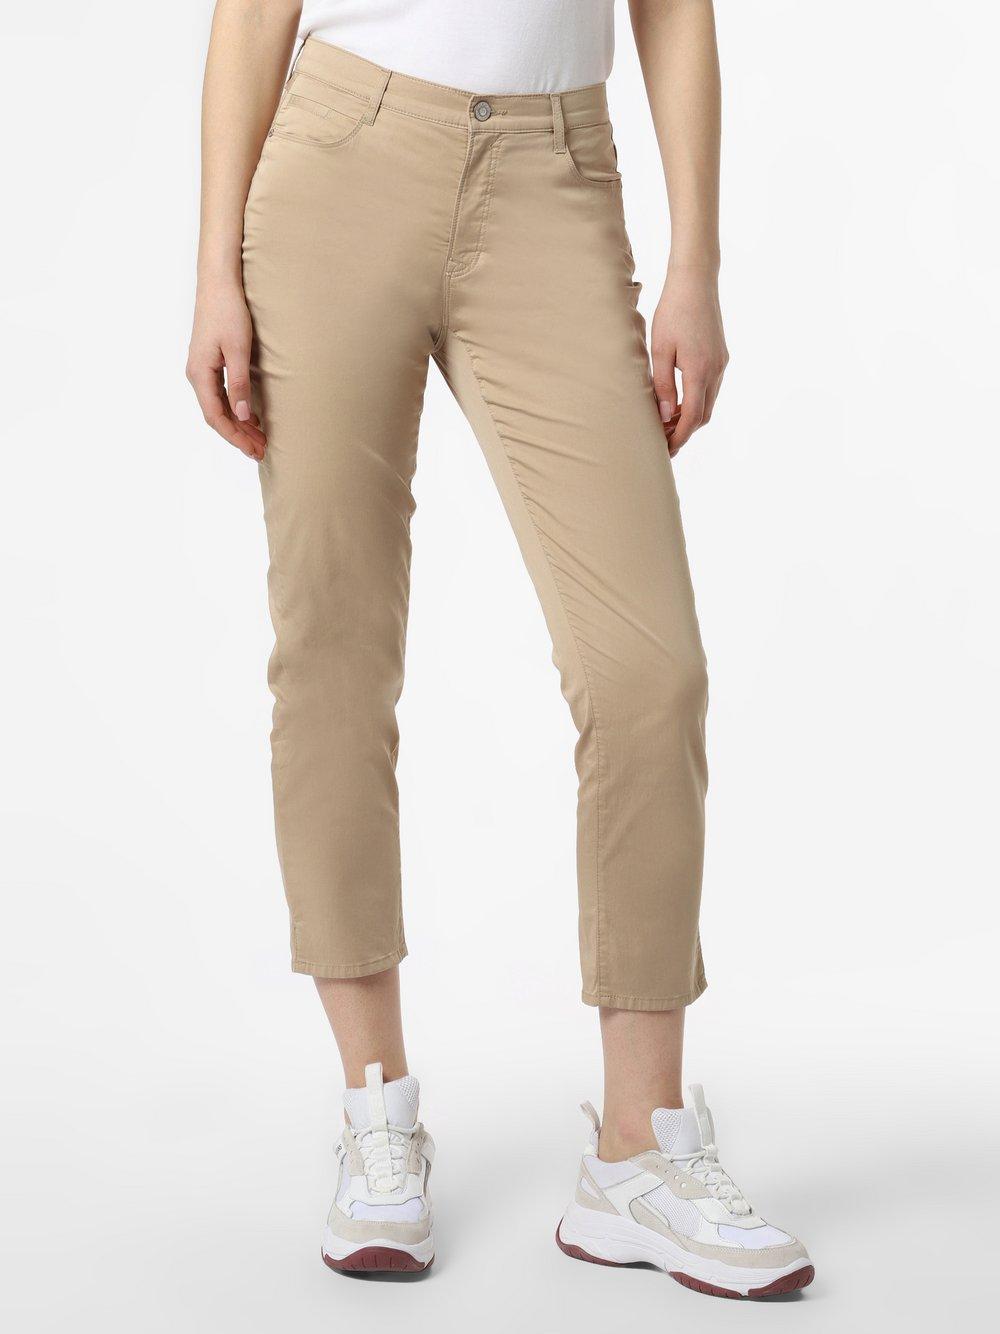 BRAX - Spodnie damskie – Mary S, beżowy